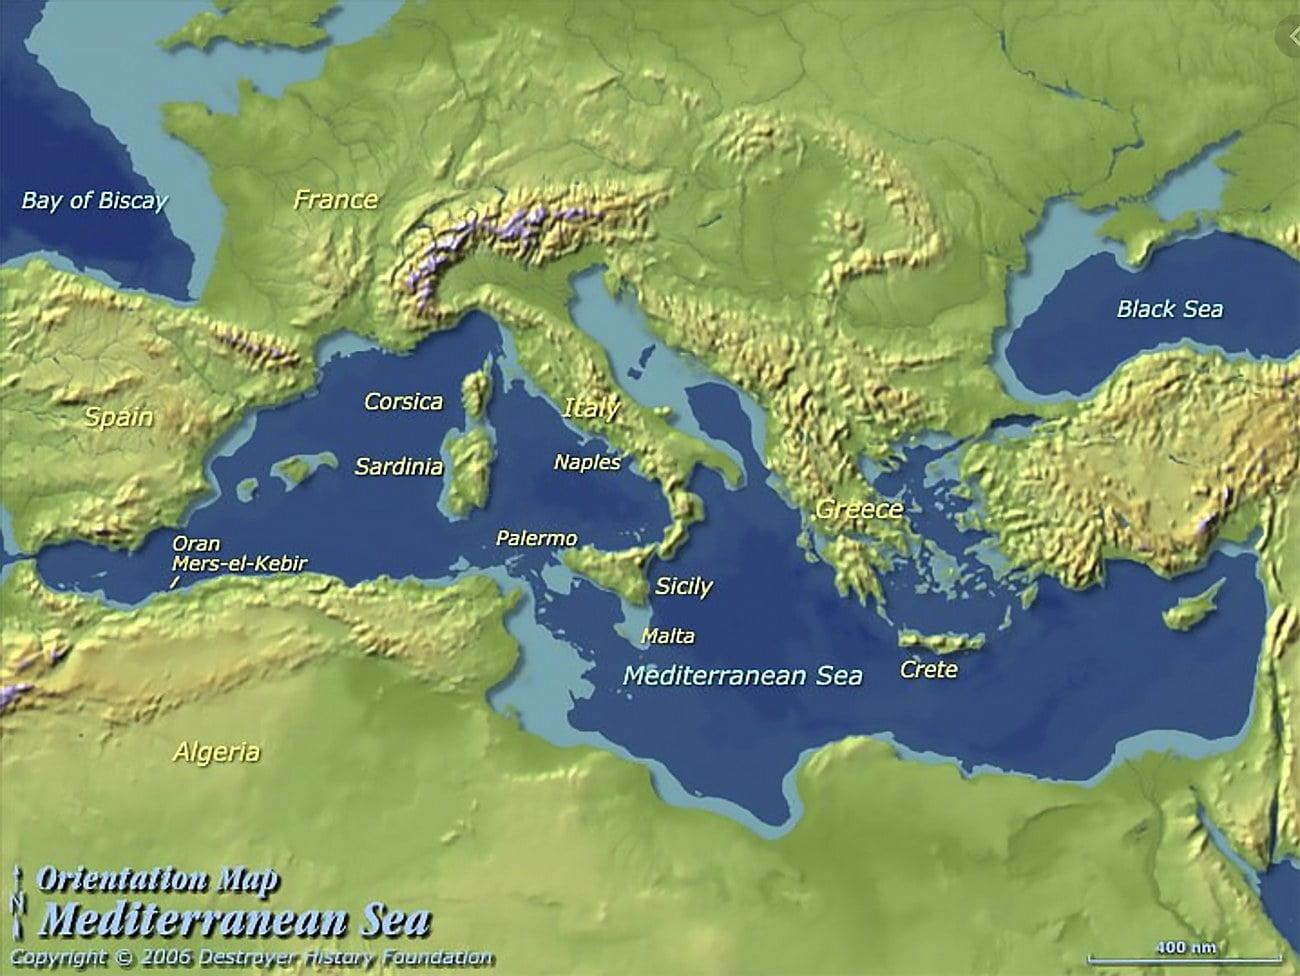 mapa do mar Mediterrâneo